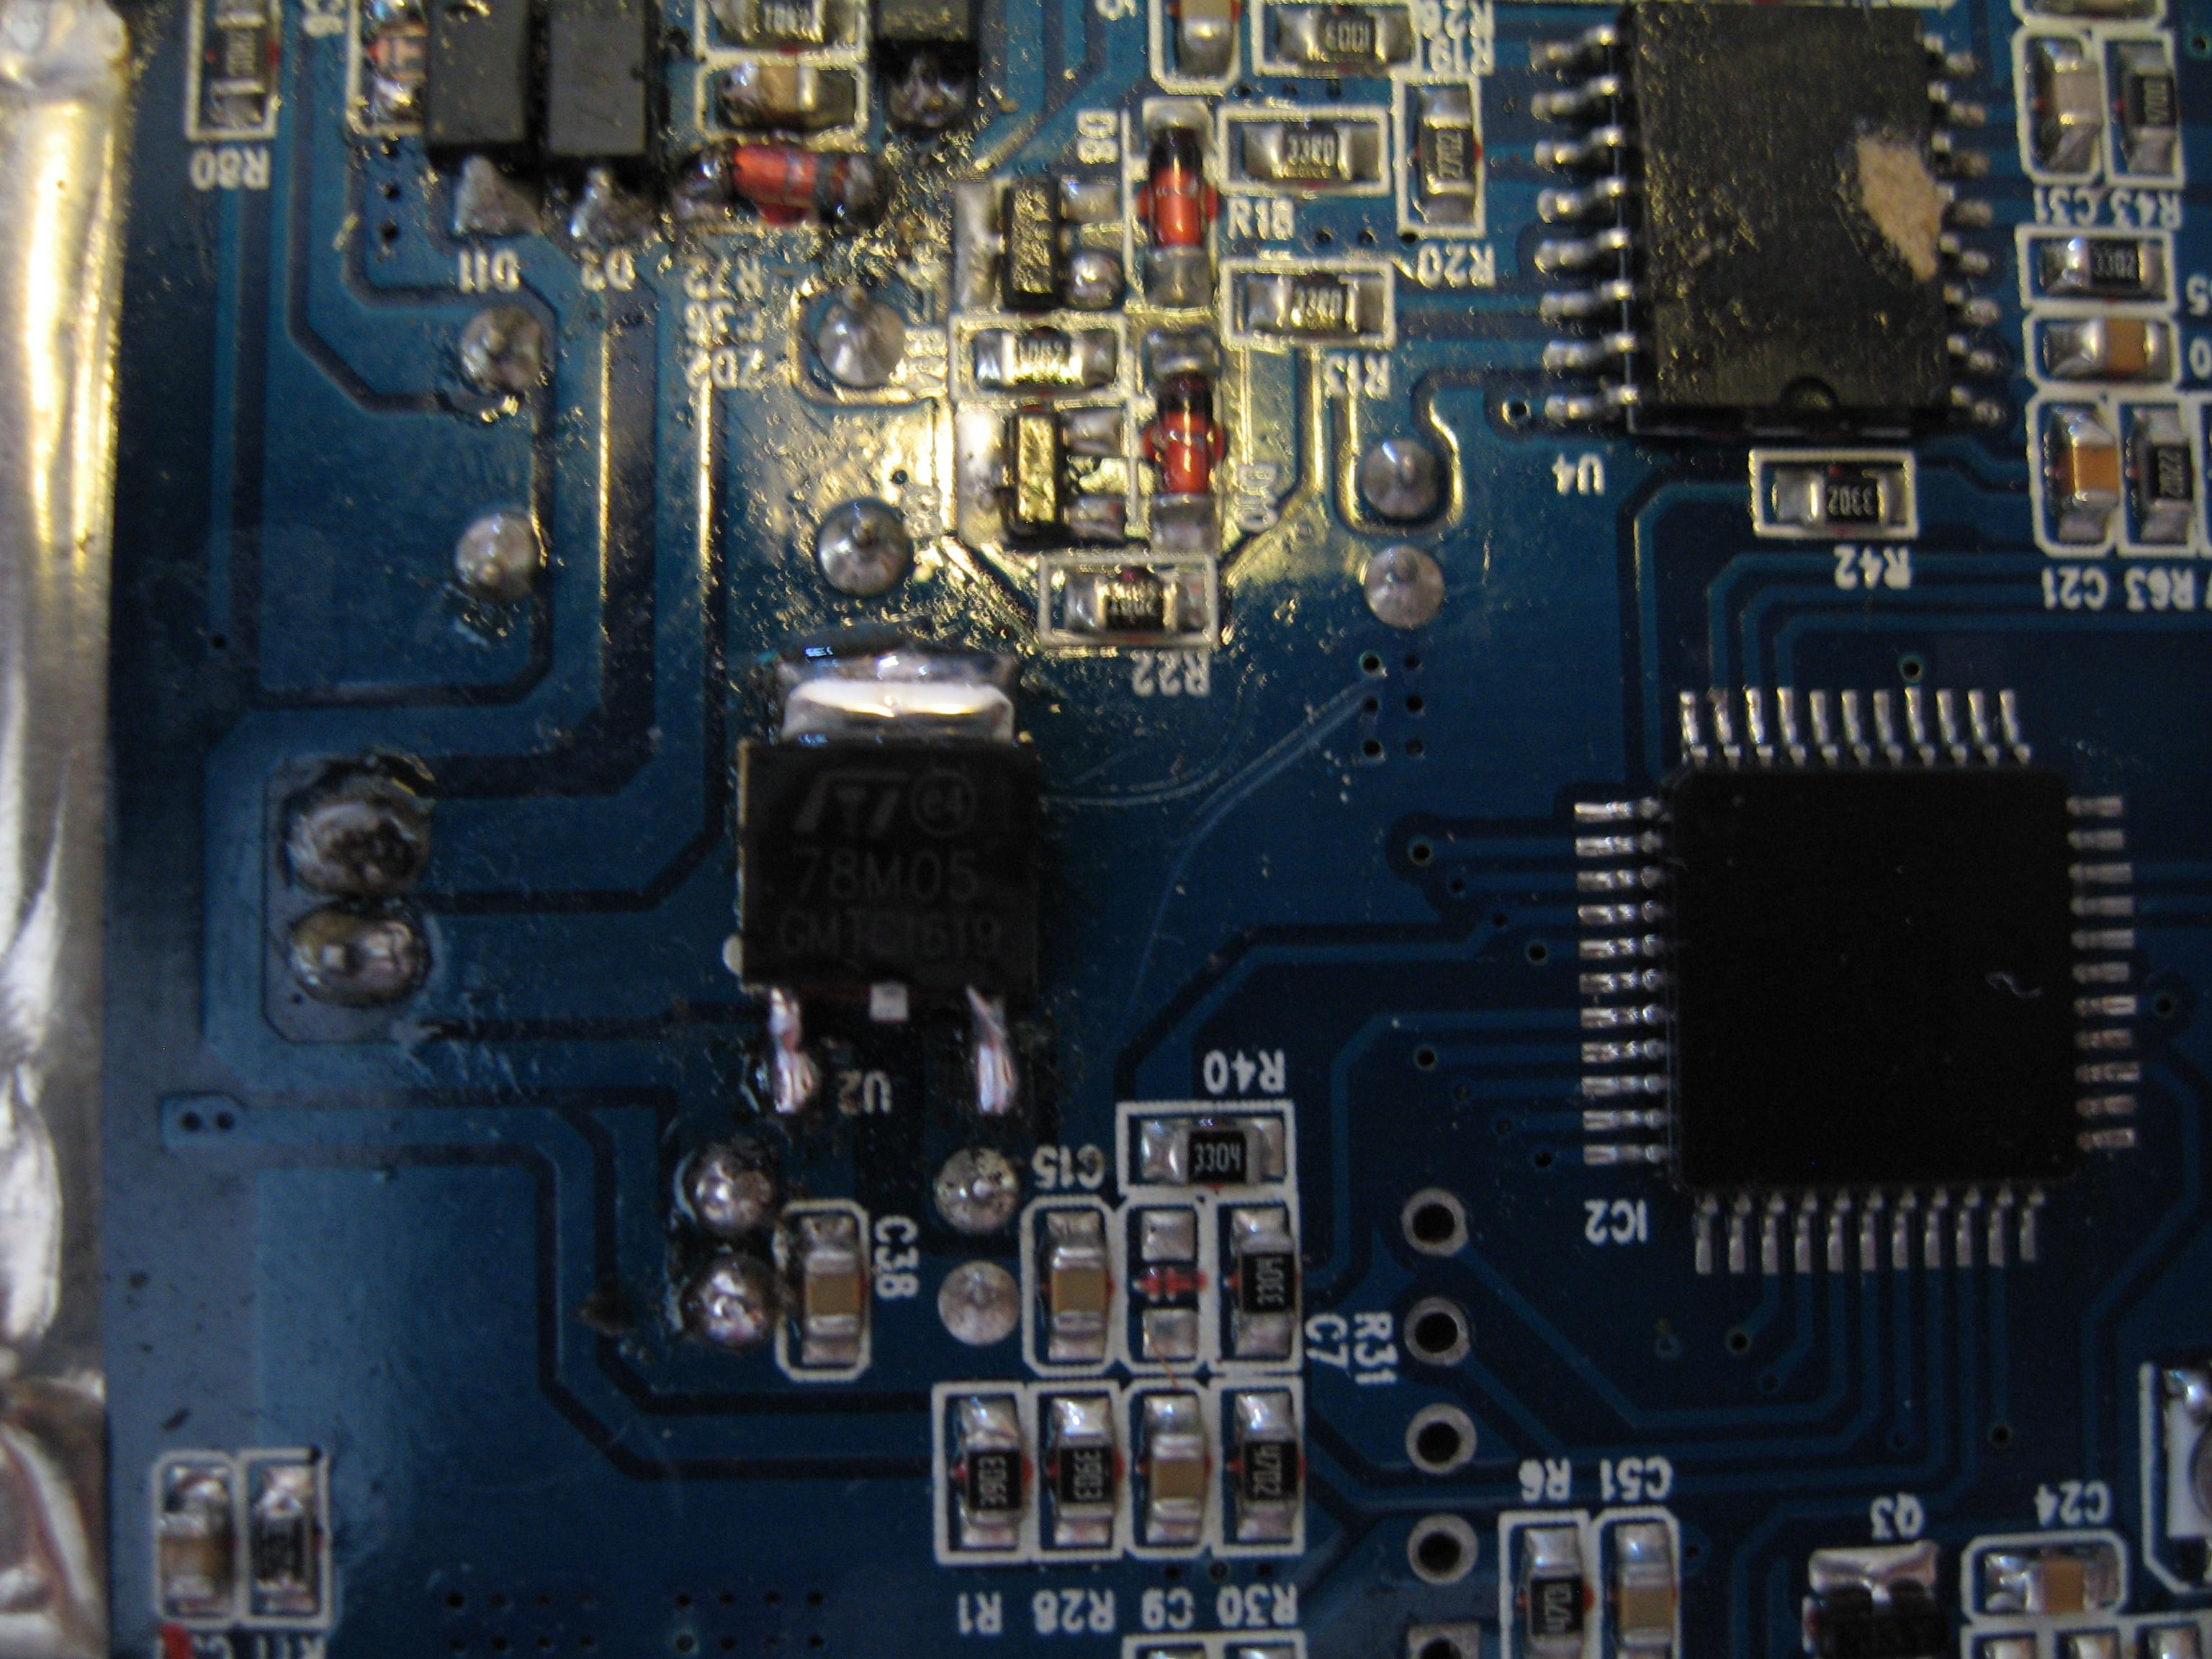 http://www.energialternativa.info/public/newforum/ForumEA/R/IMG_4905.JPG